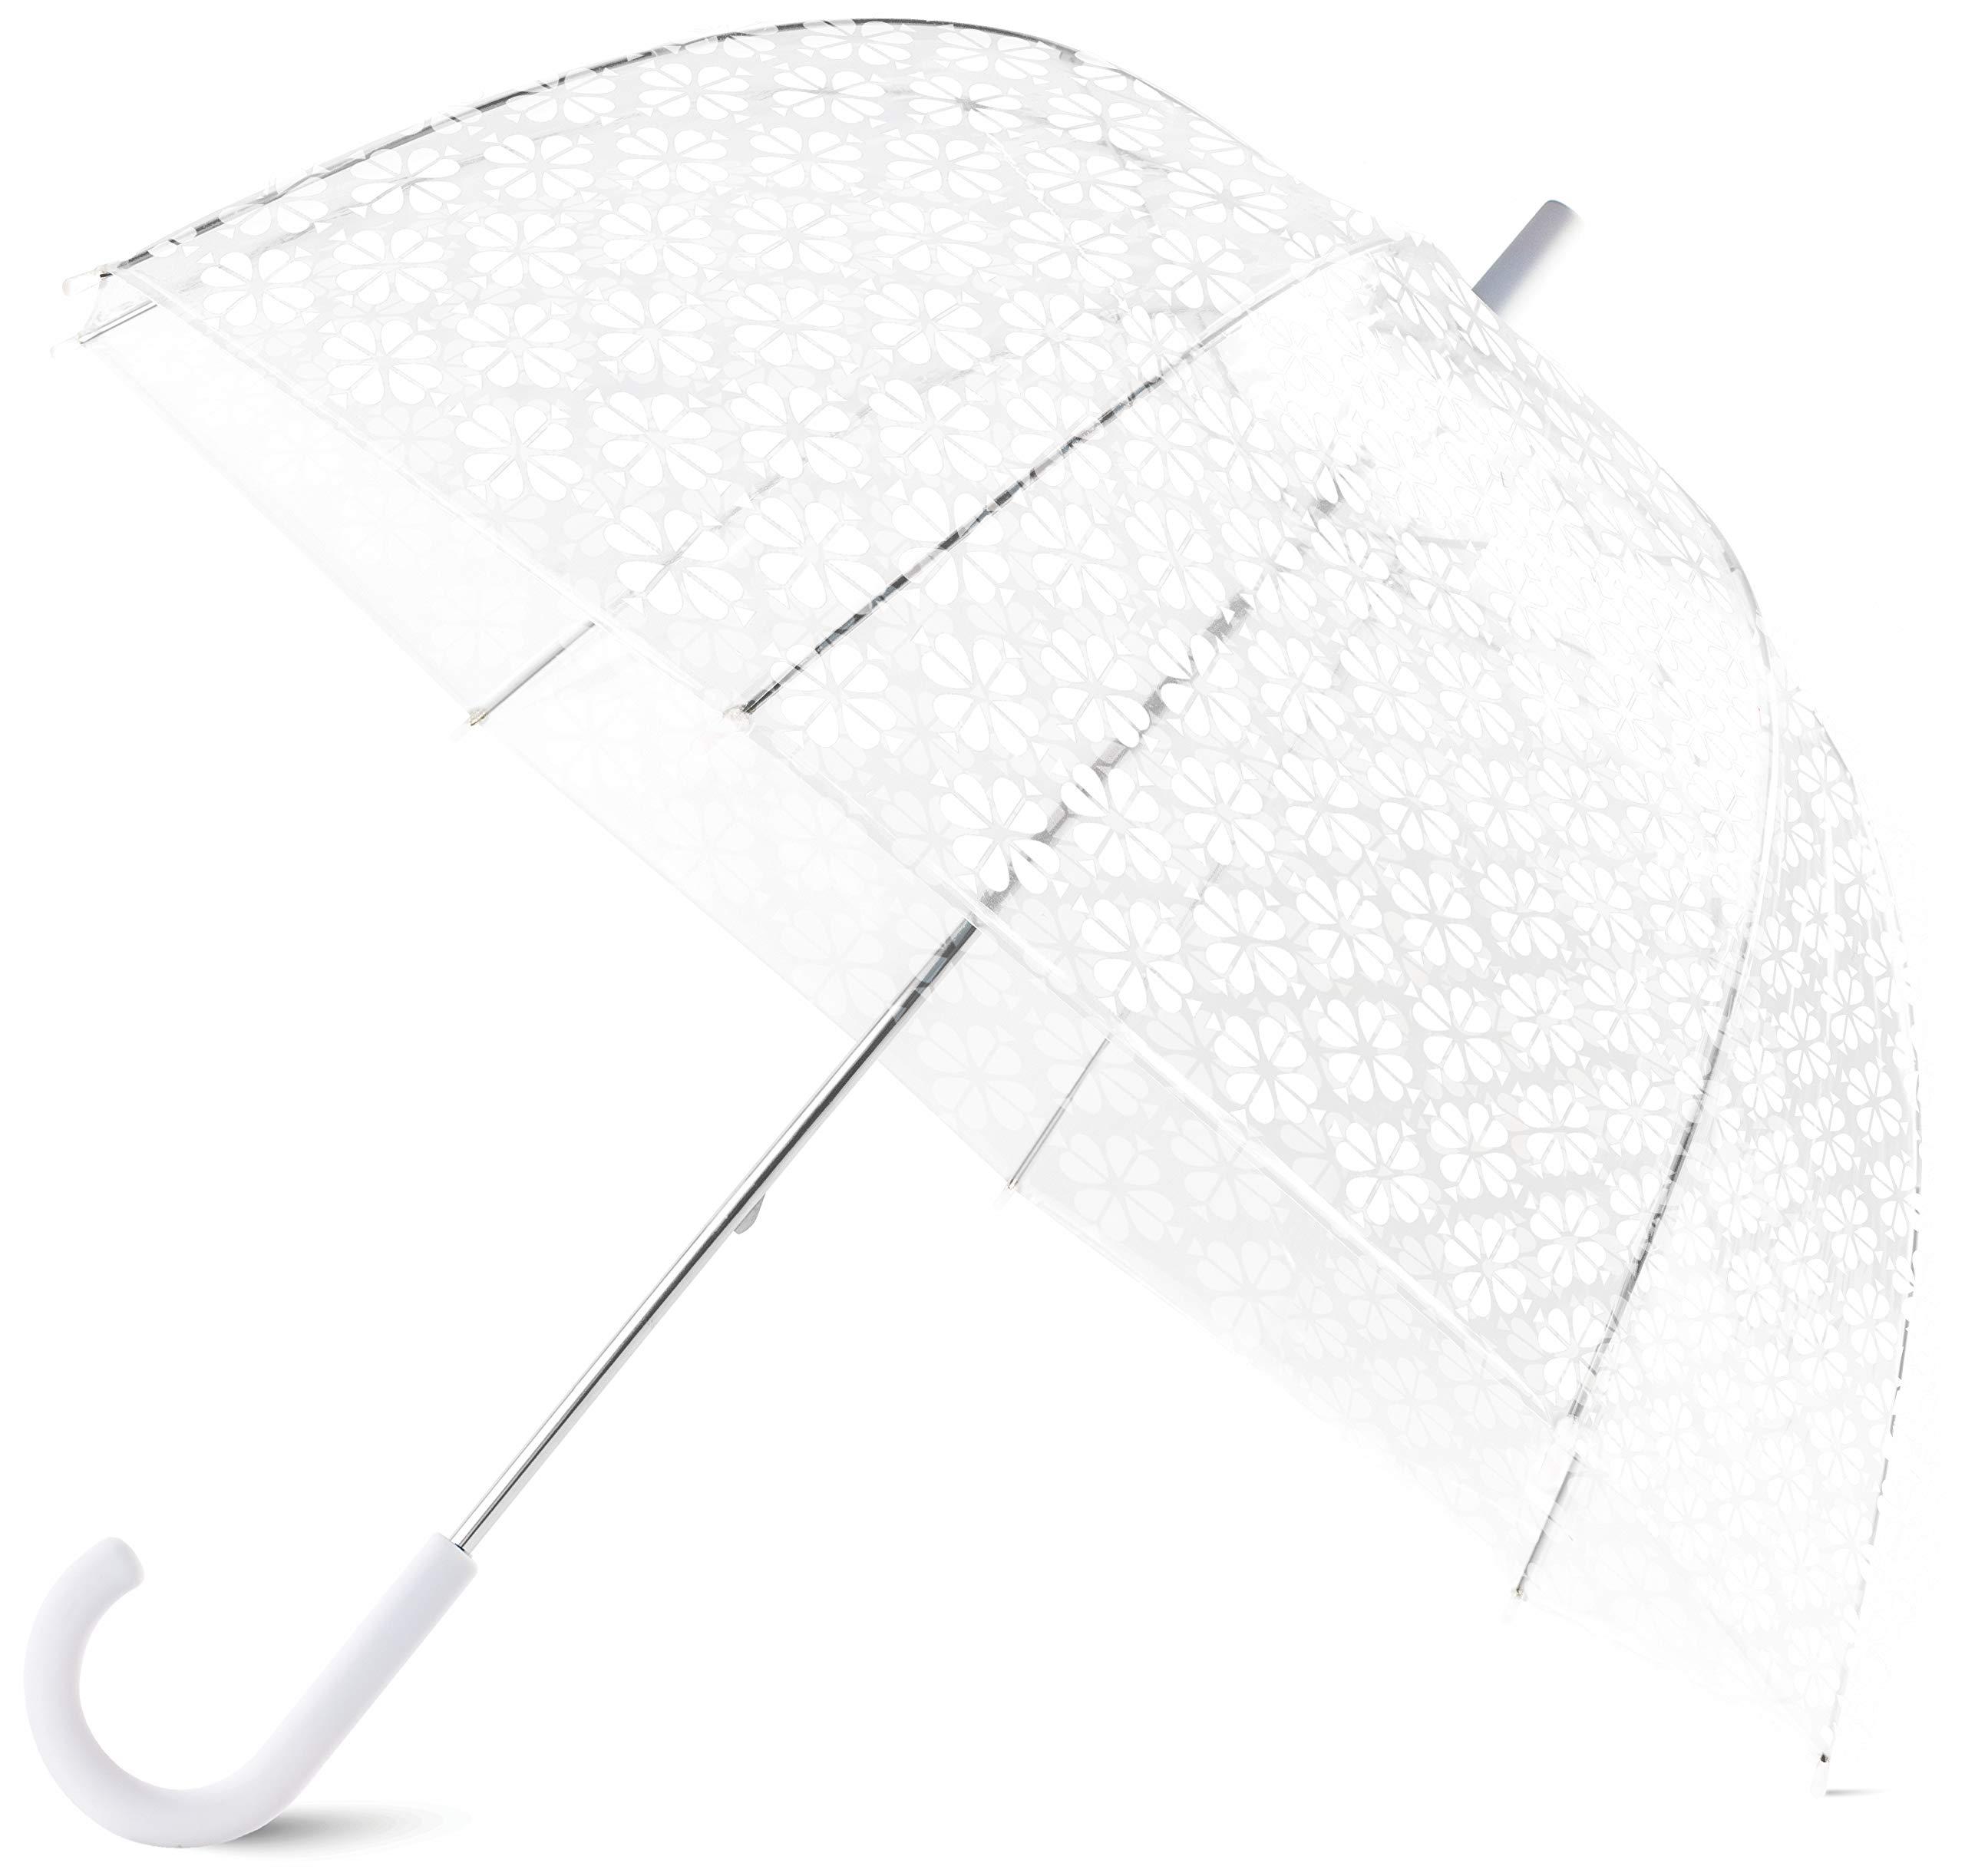 Kate Spade New York Large Dome Umbrella, White Spade Flower by Kate Spade New York